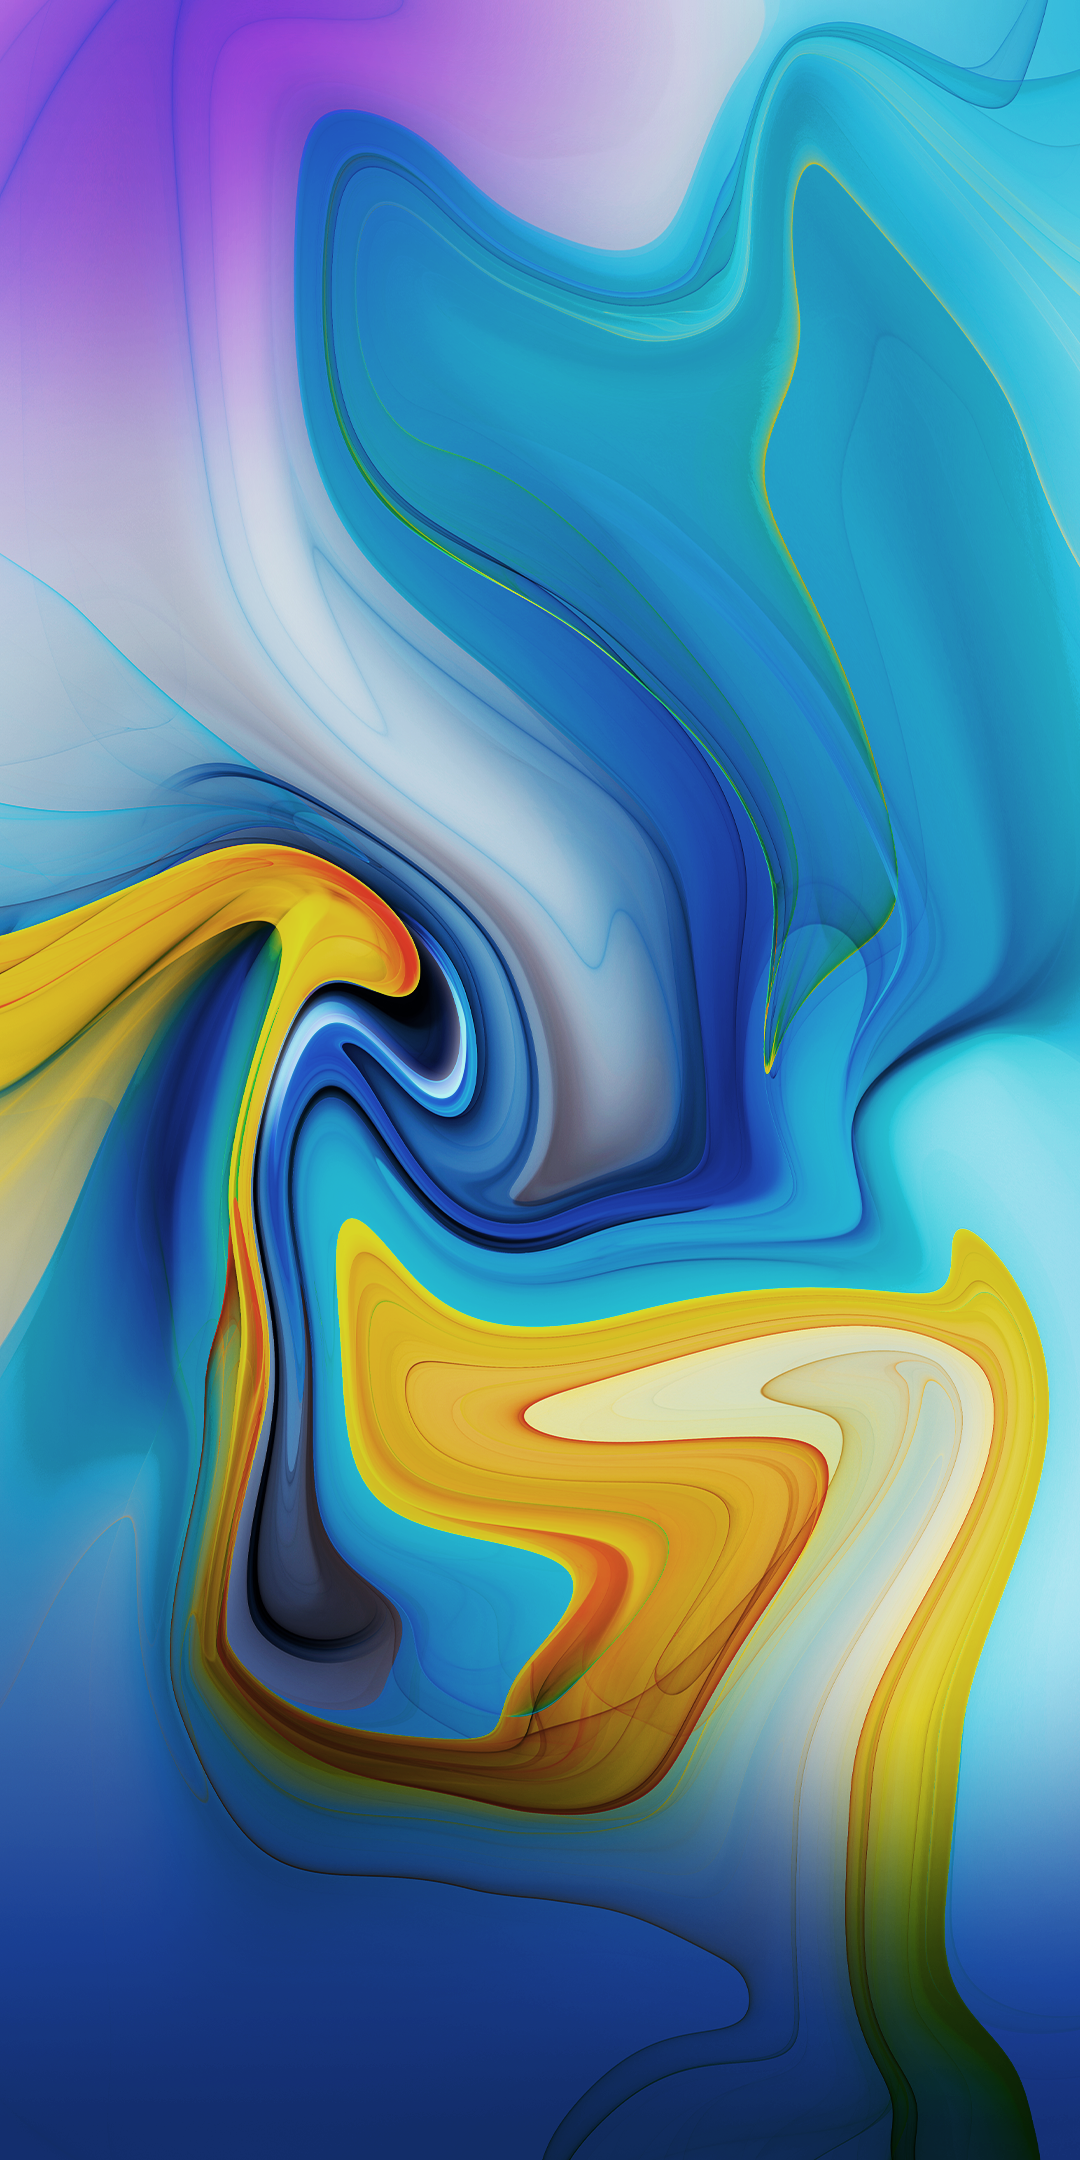 Download Infinix Hot 7 Pro Official Wallpaper Here Full Hd Resolution 720 X 1520 Pixels Hd Galaxy Wallpaper Iphone Huawei Wallpapers Samsung Galaxy Wallpaper